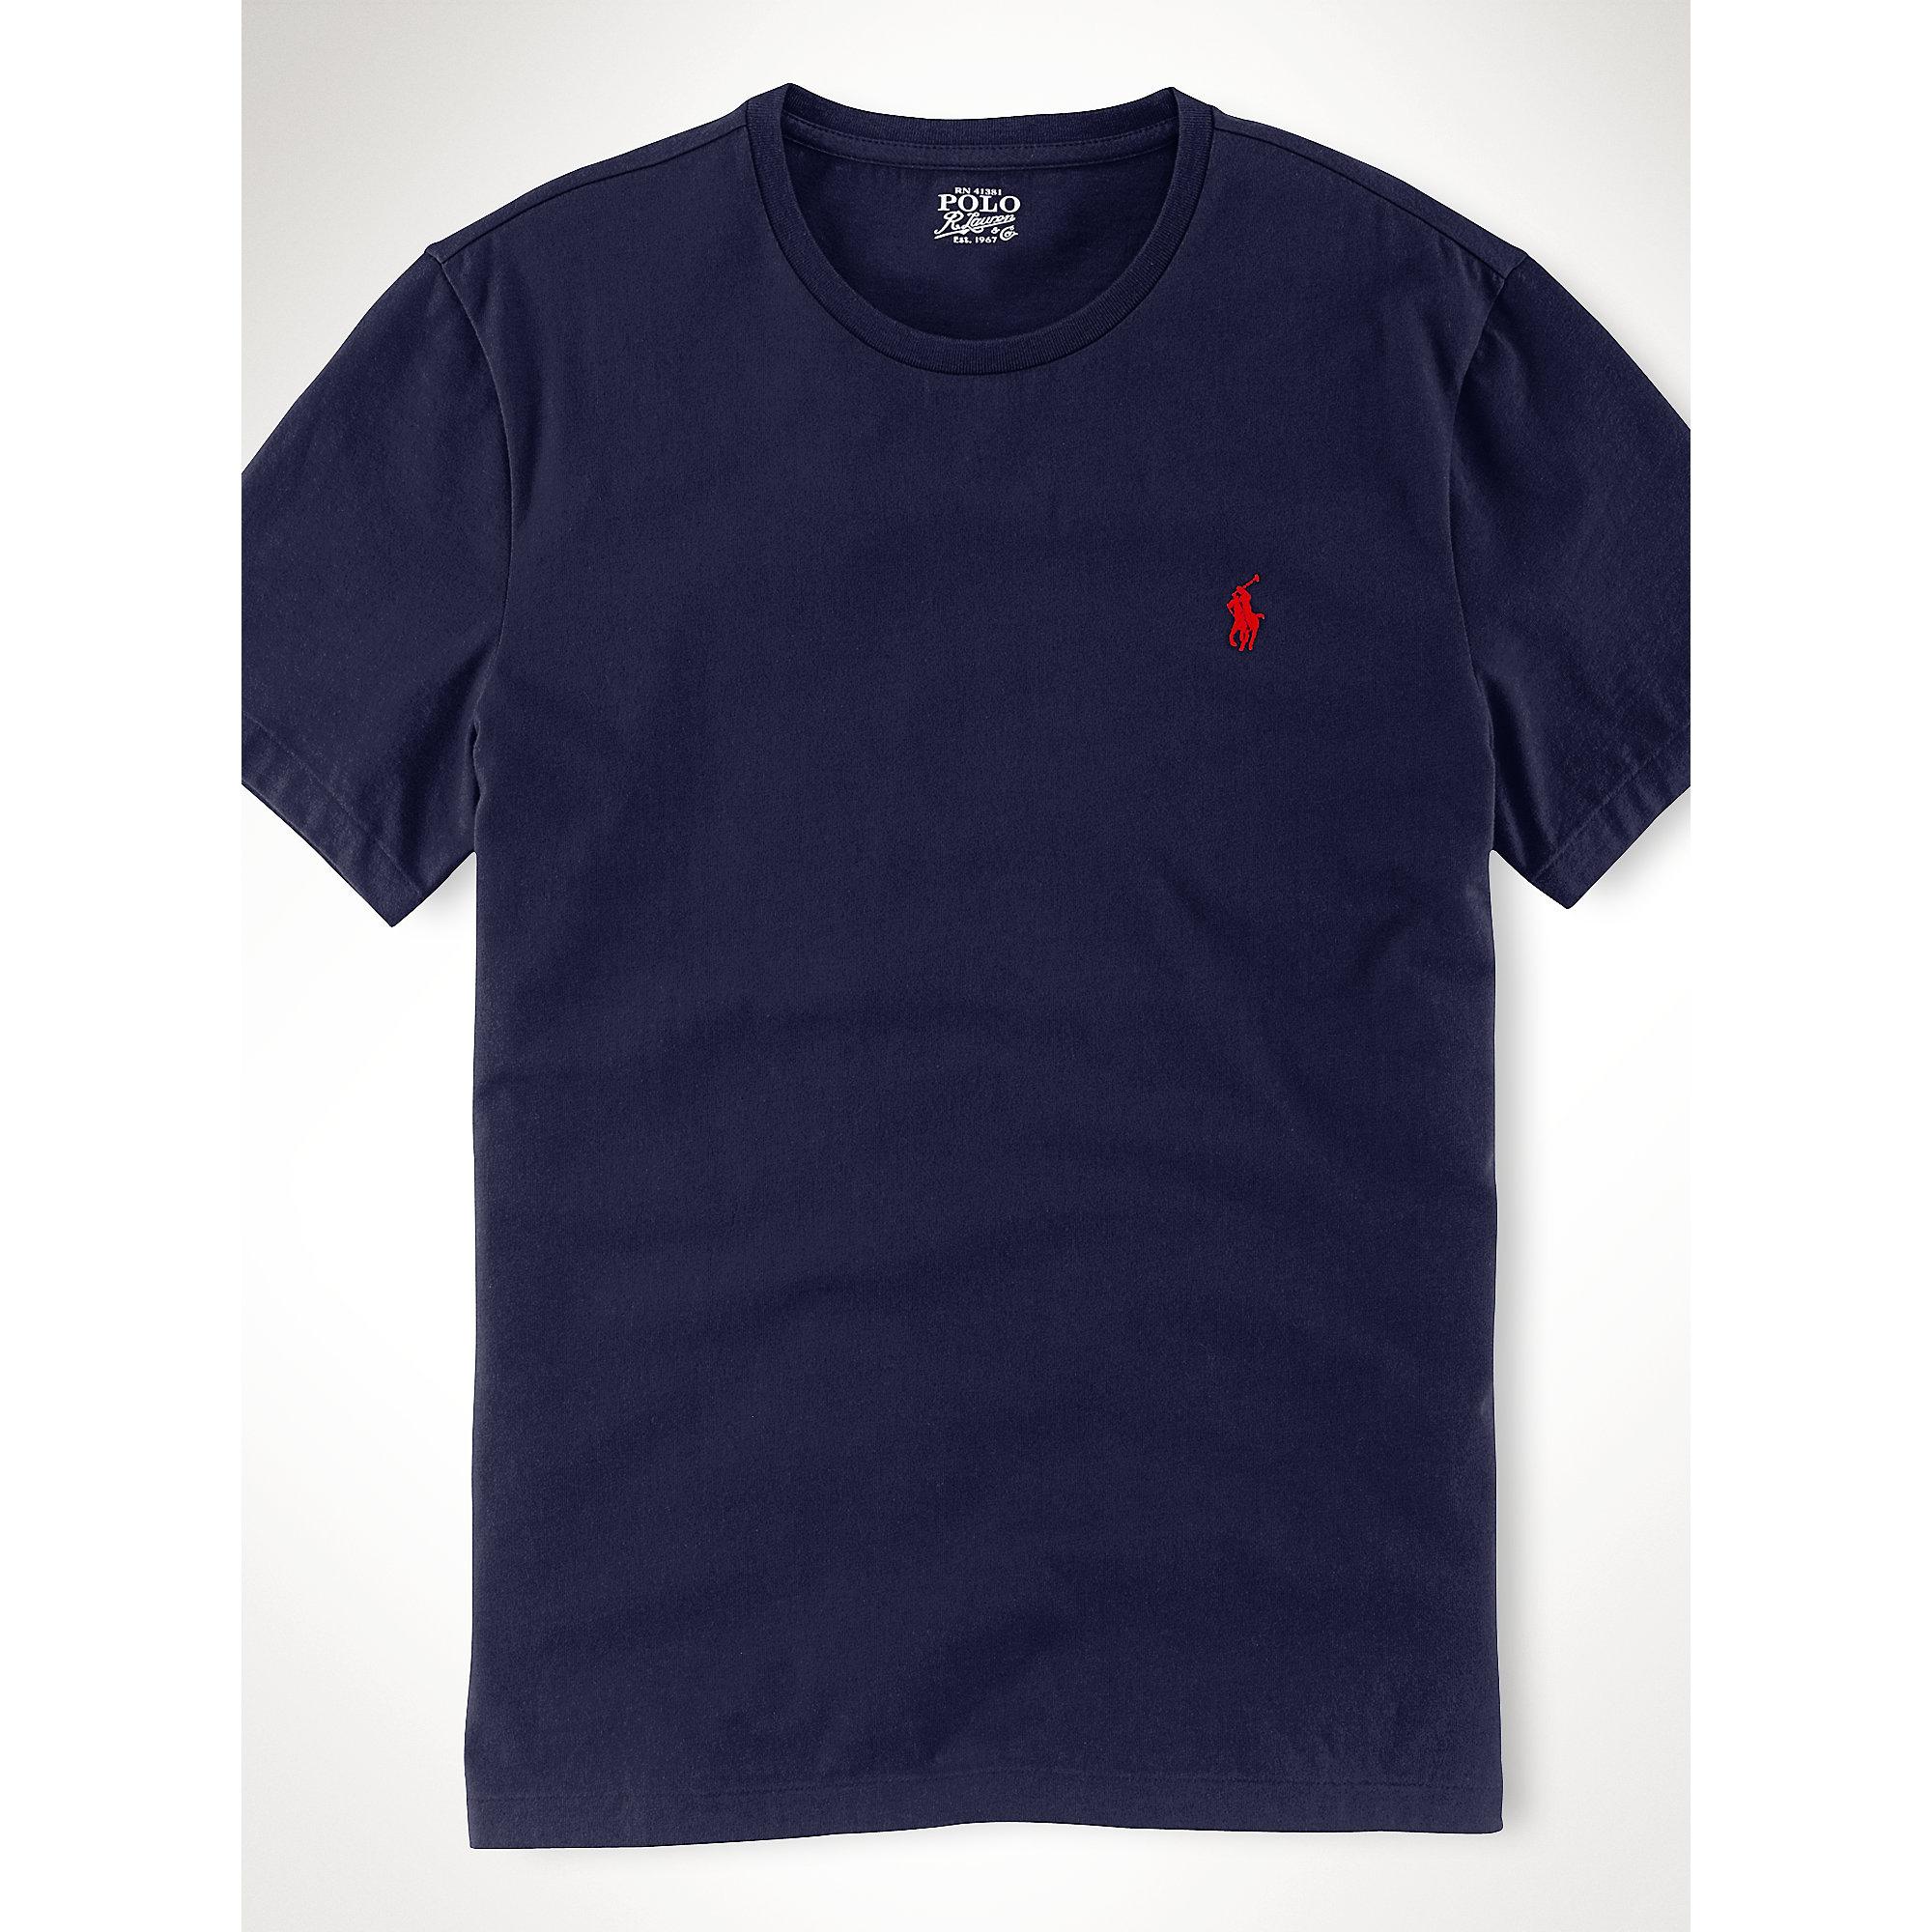 Polo ralph lauren custom fit t shirt in blue for men ink for Polo custom fit t shirts